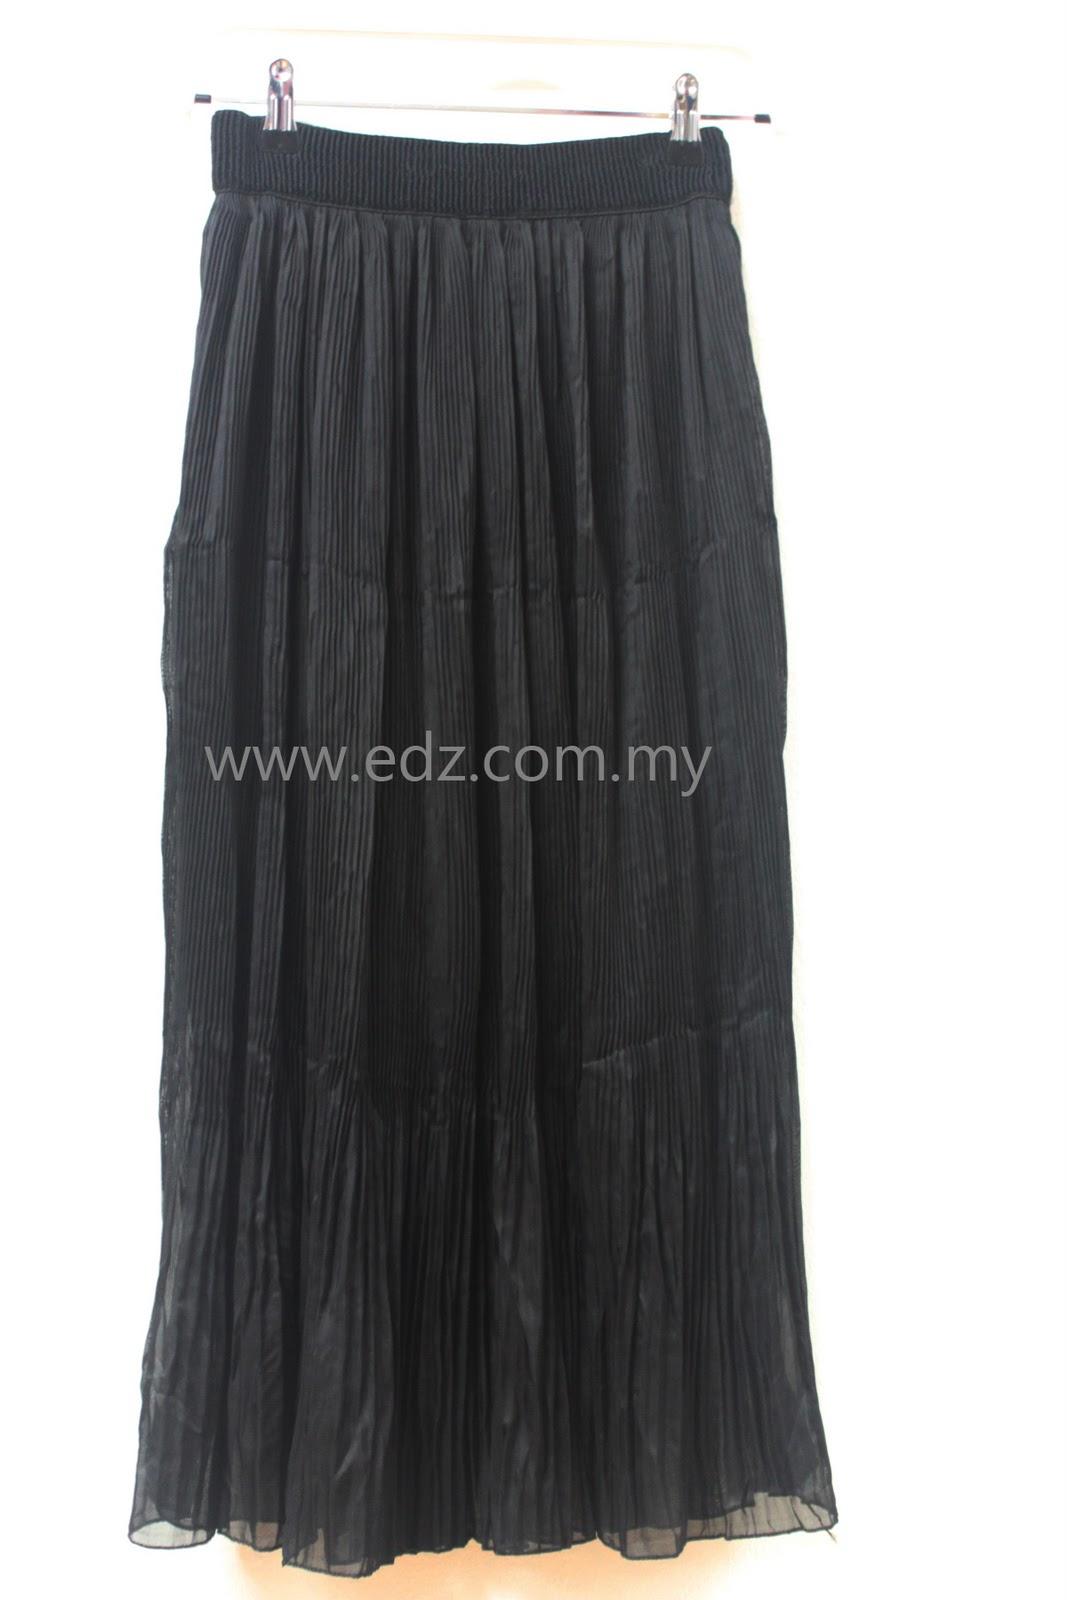 edz eightdesigns malaysia s shopping muslimah